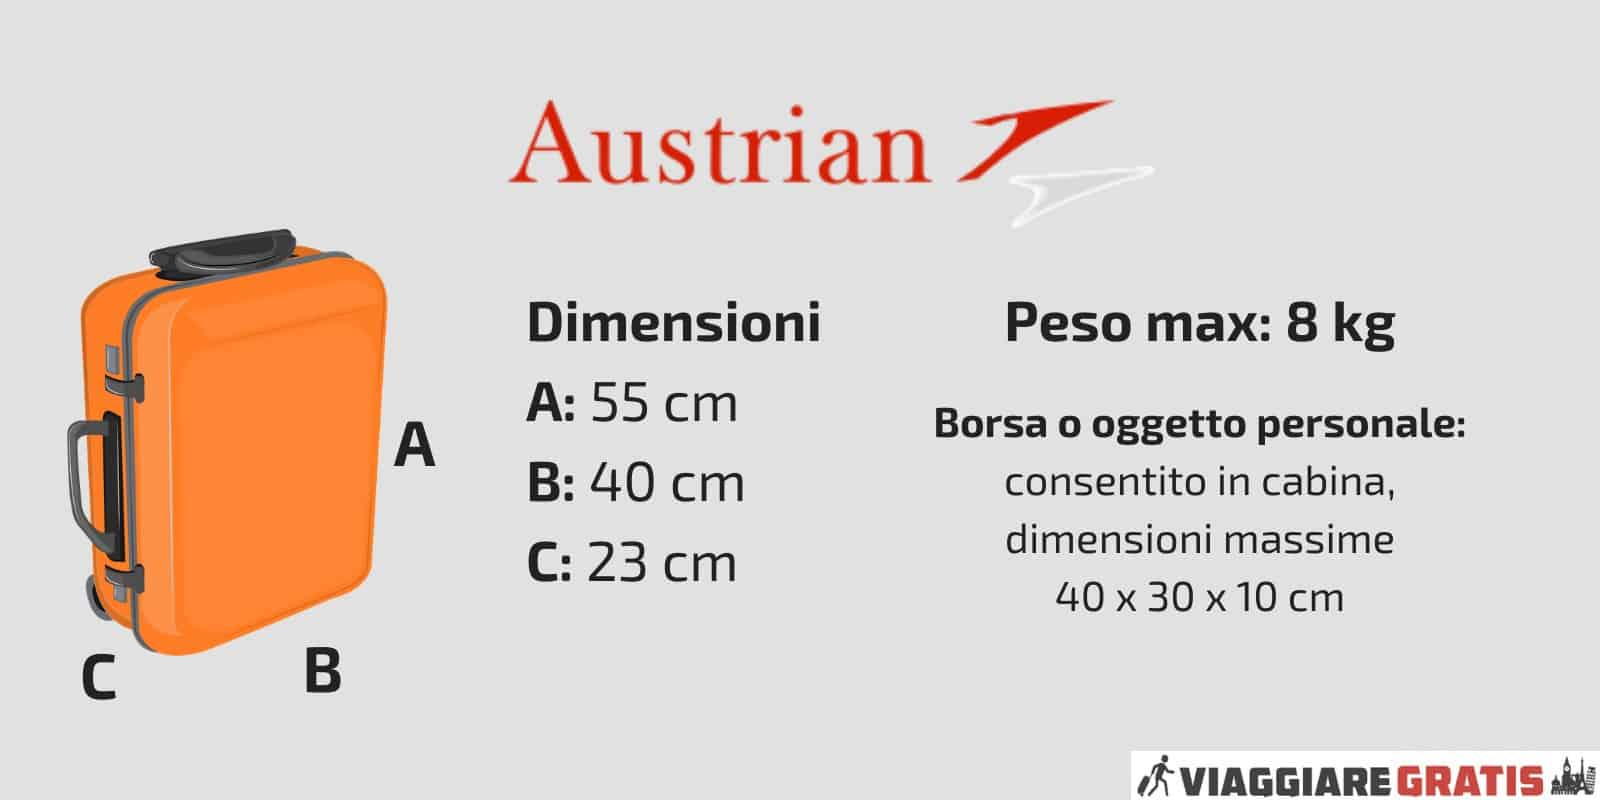 Bagaglio a Mano Austrian Airlines